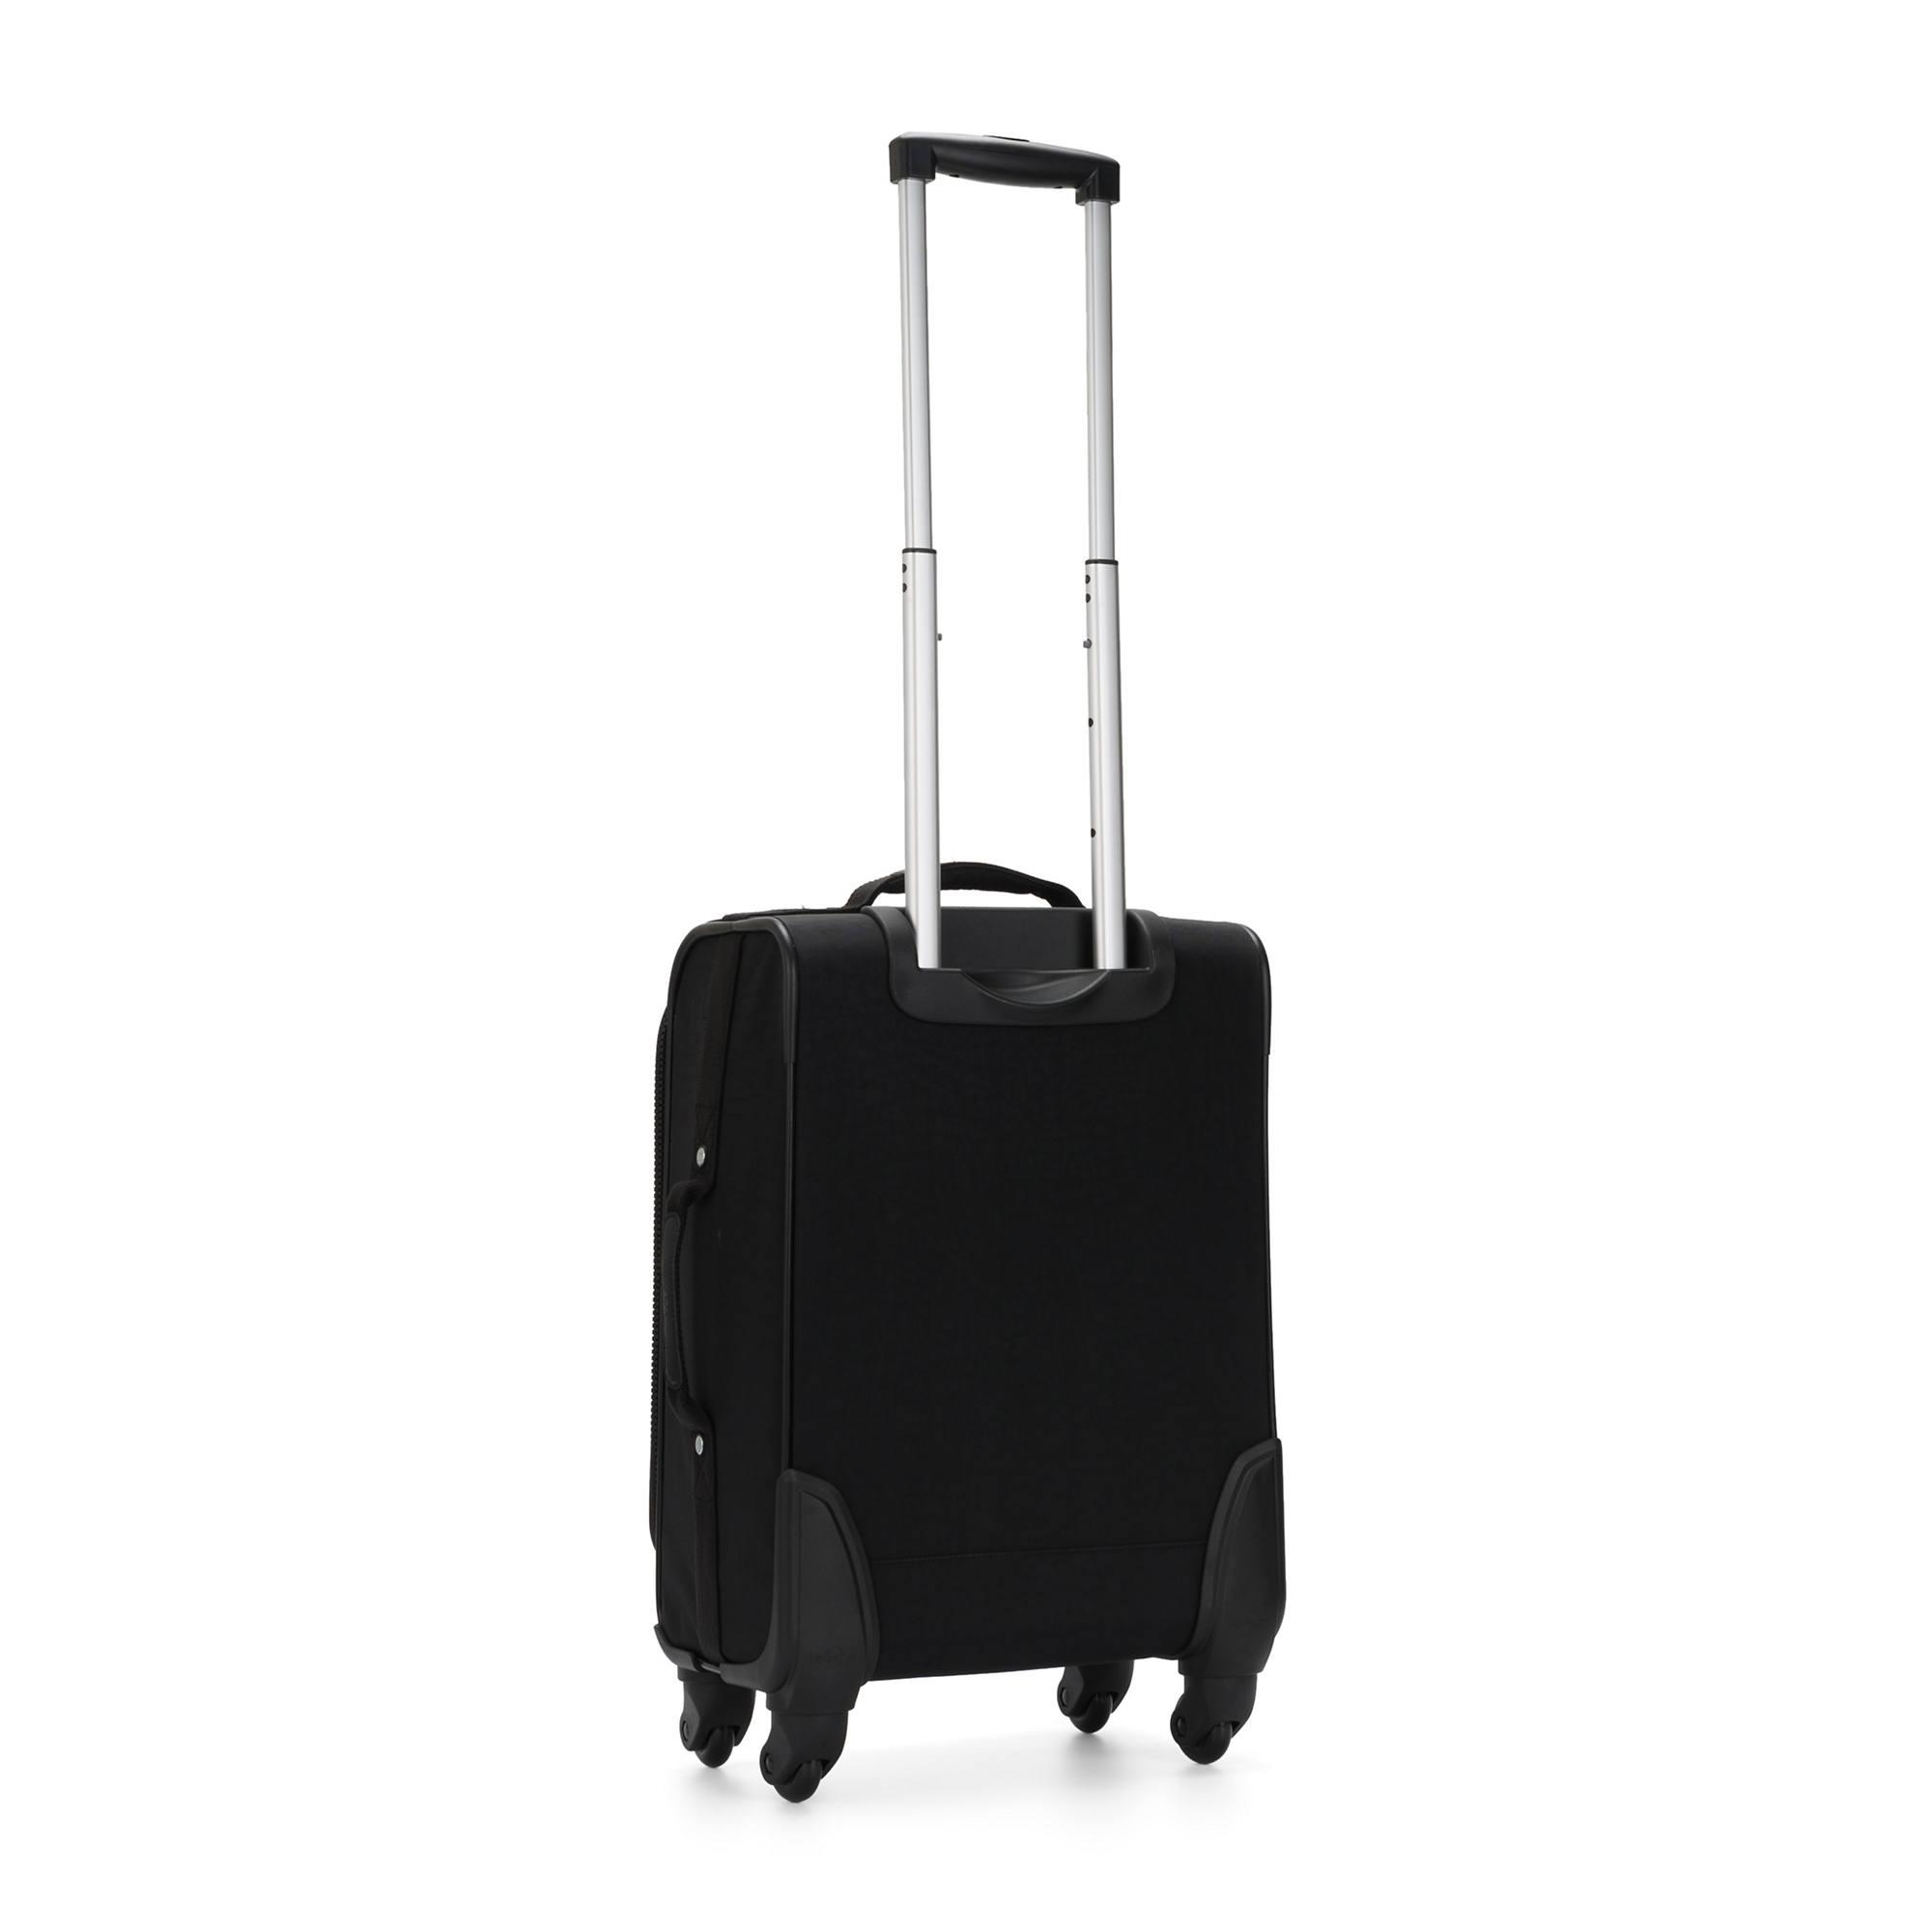 thumbnail 8 - Kipling Parker Small Rolling Luggage